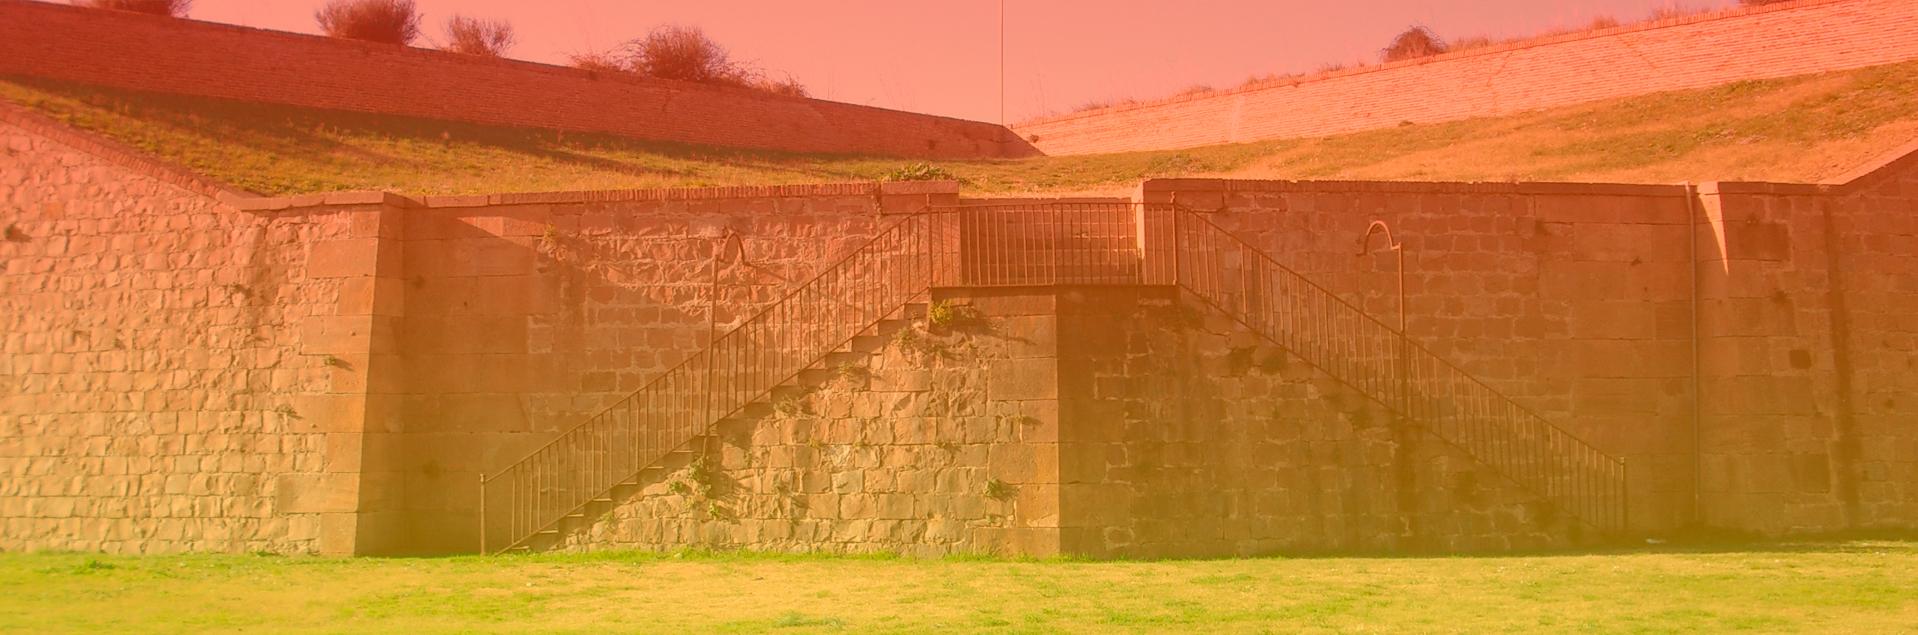 Muralla del Castillo de Montjuic